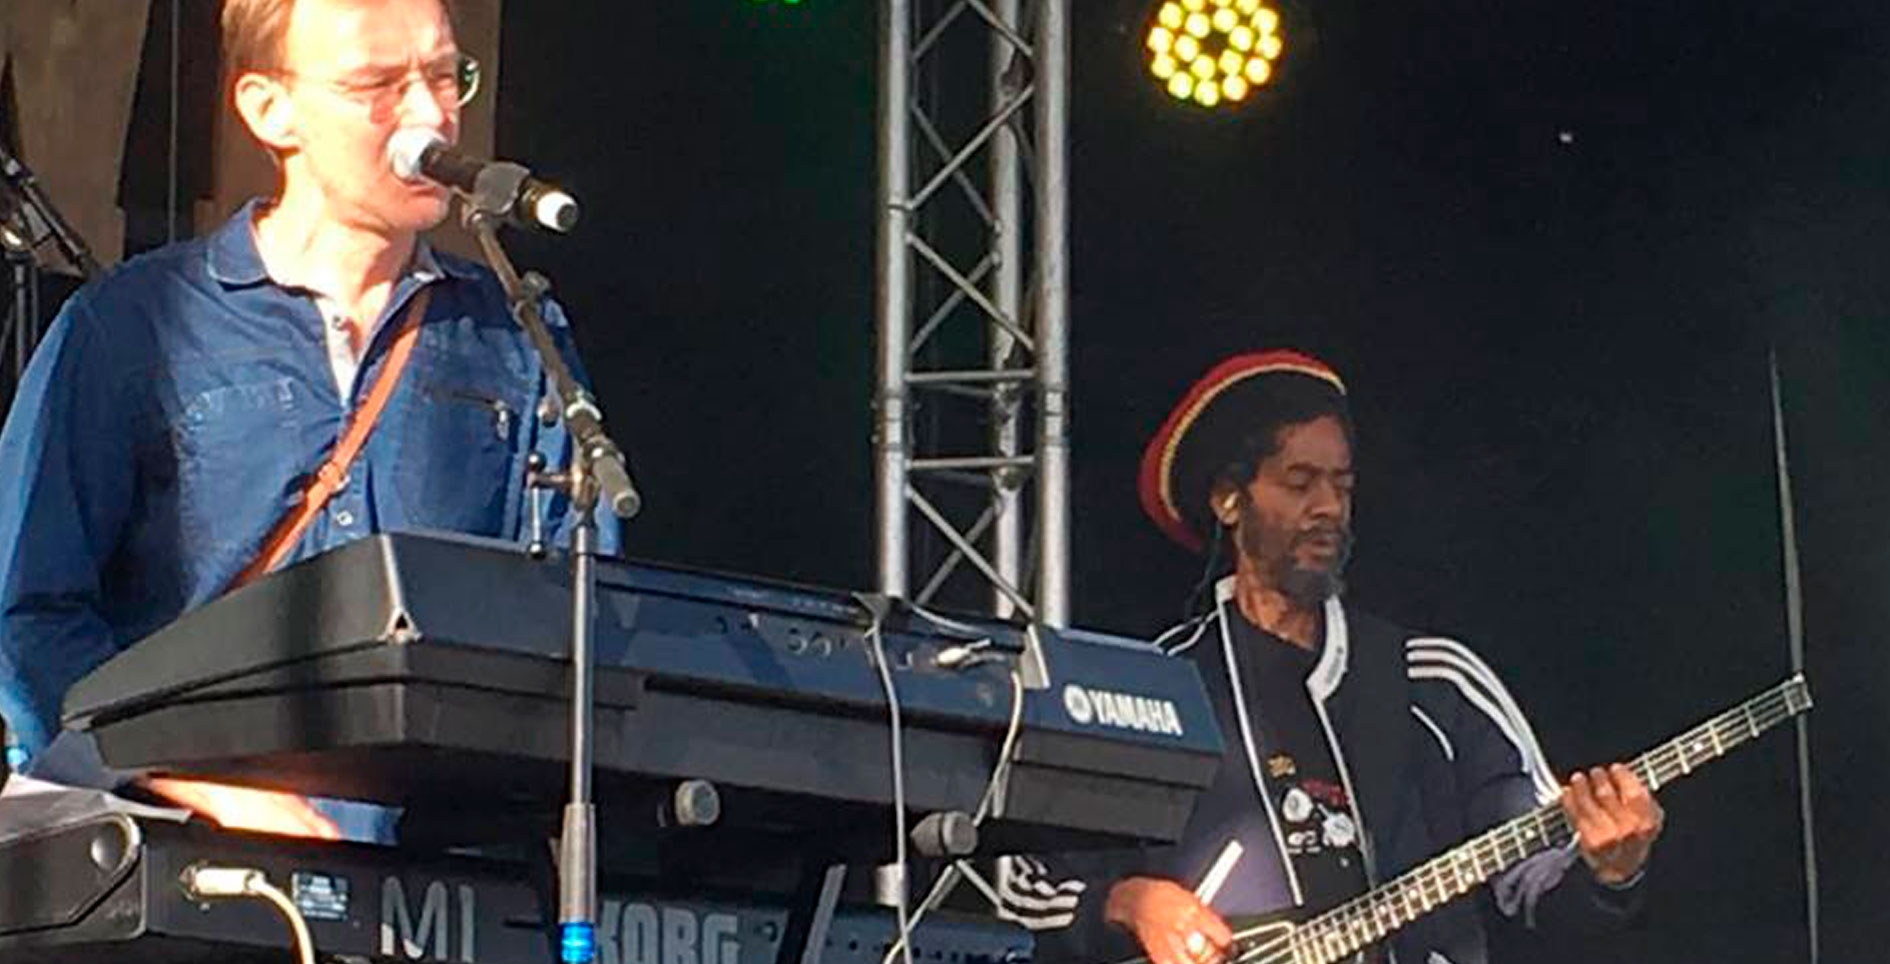 Festival CRAZYTOWN - Thiverval-Grinon - 08/09/2018